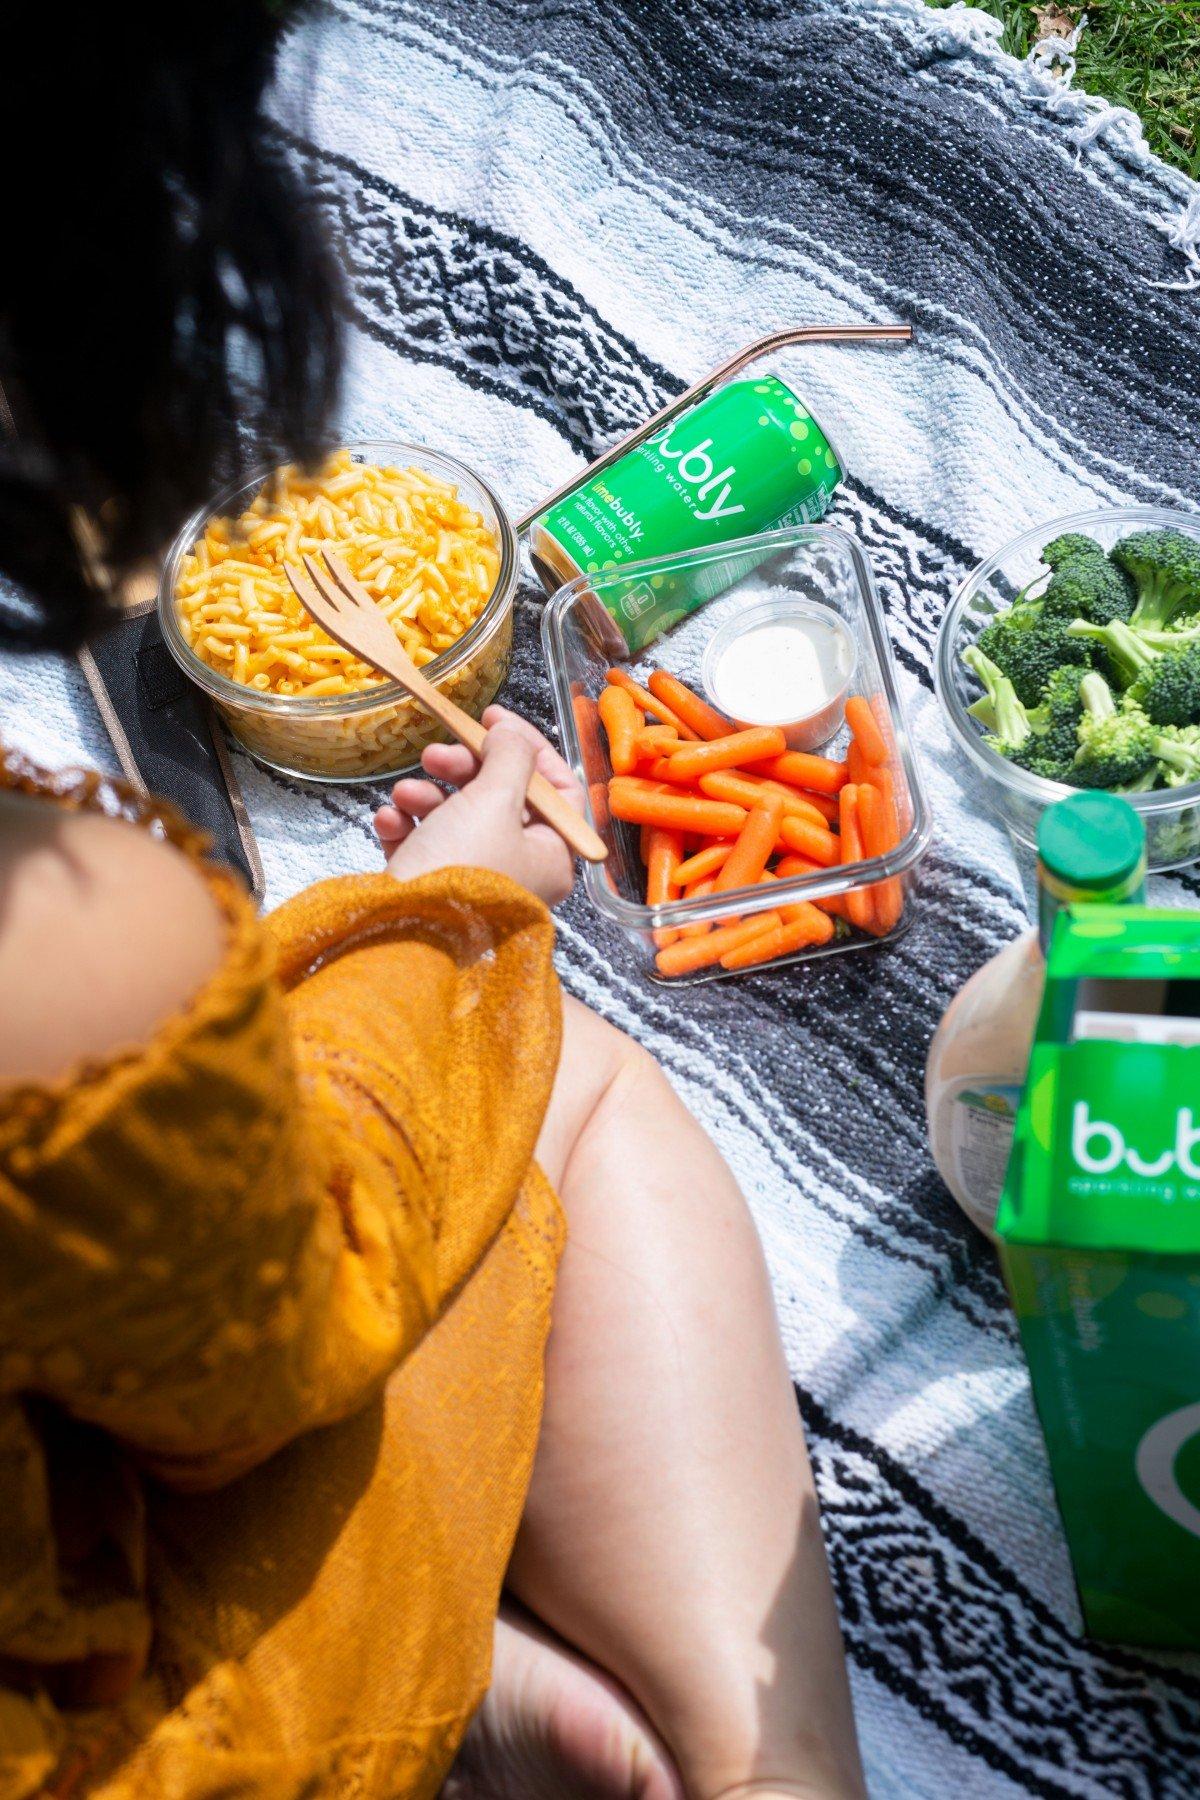 food insecurity Walmart Feeding America